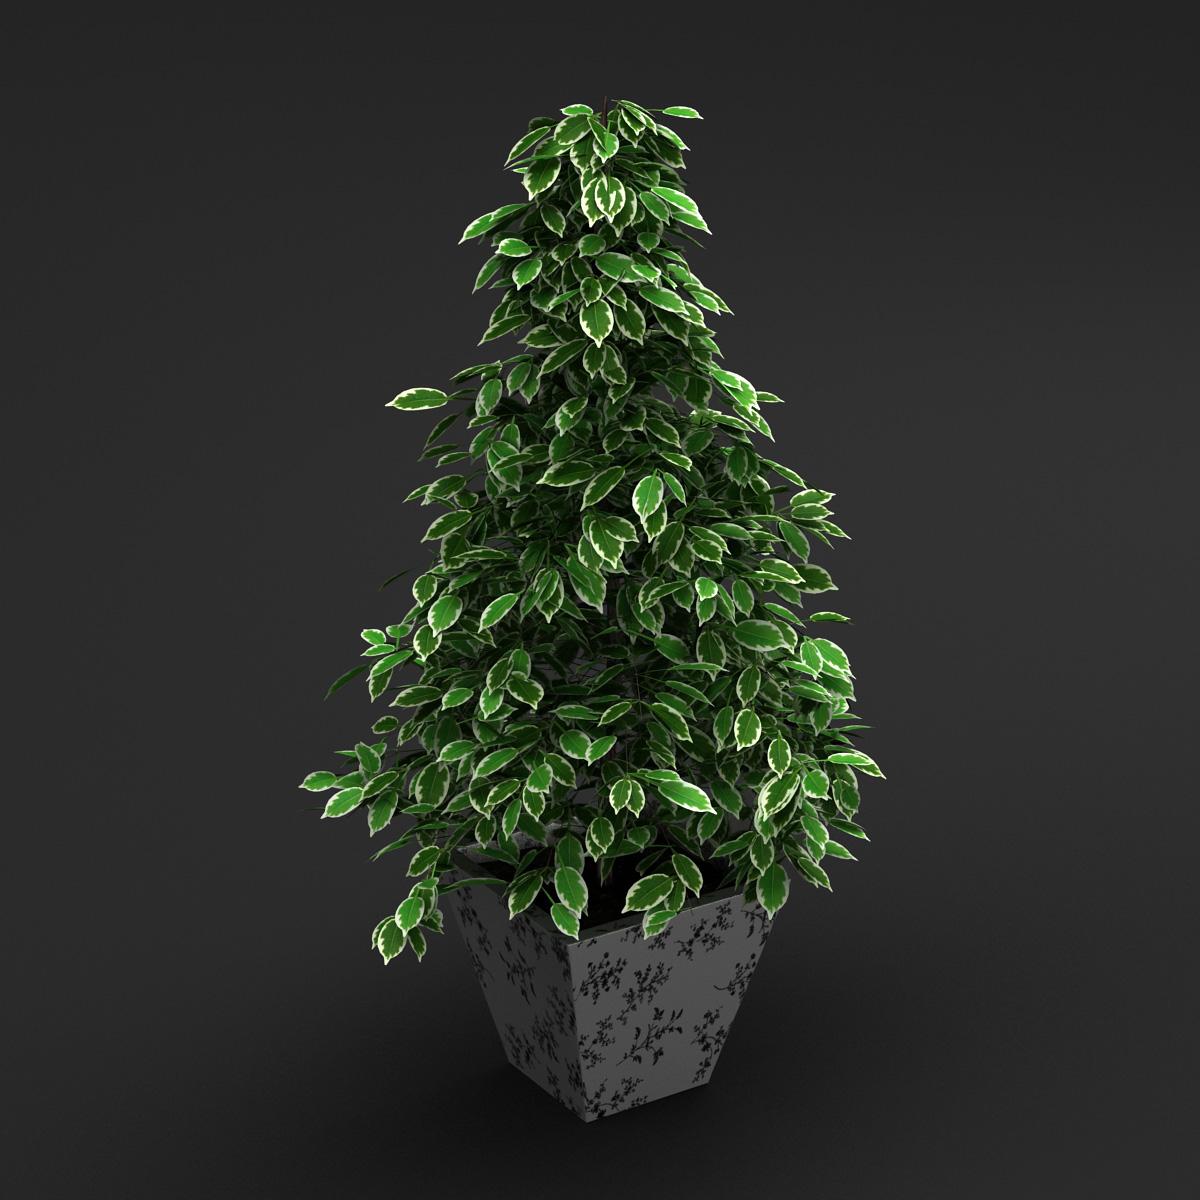 MAIN FEATURES Interior Plants